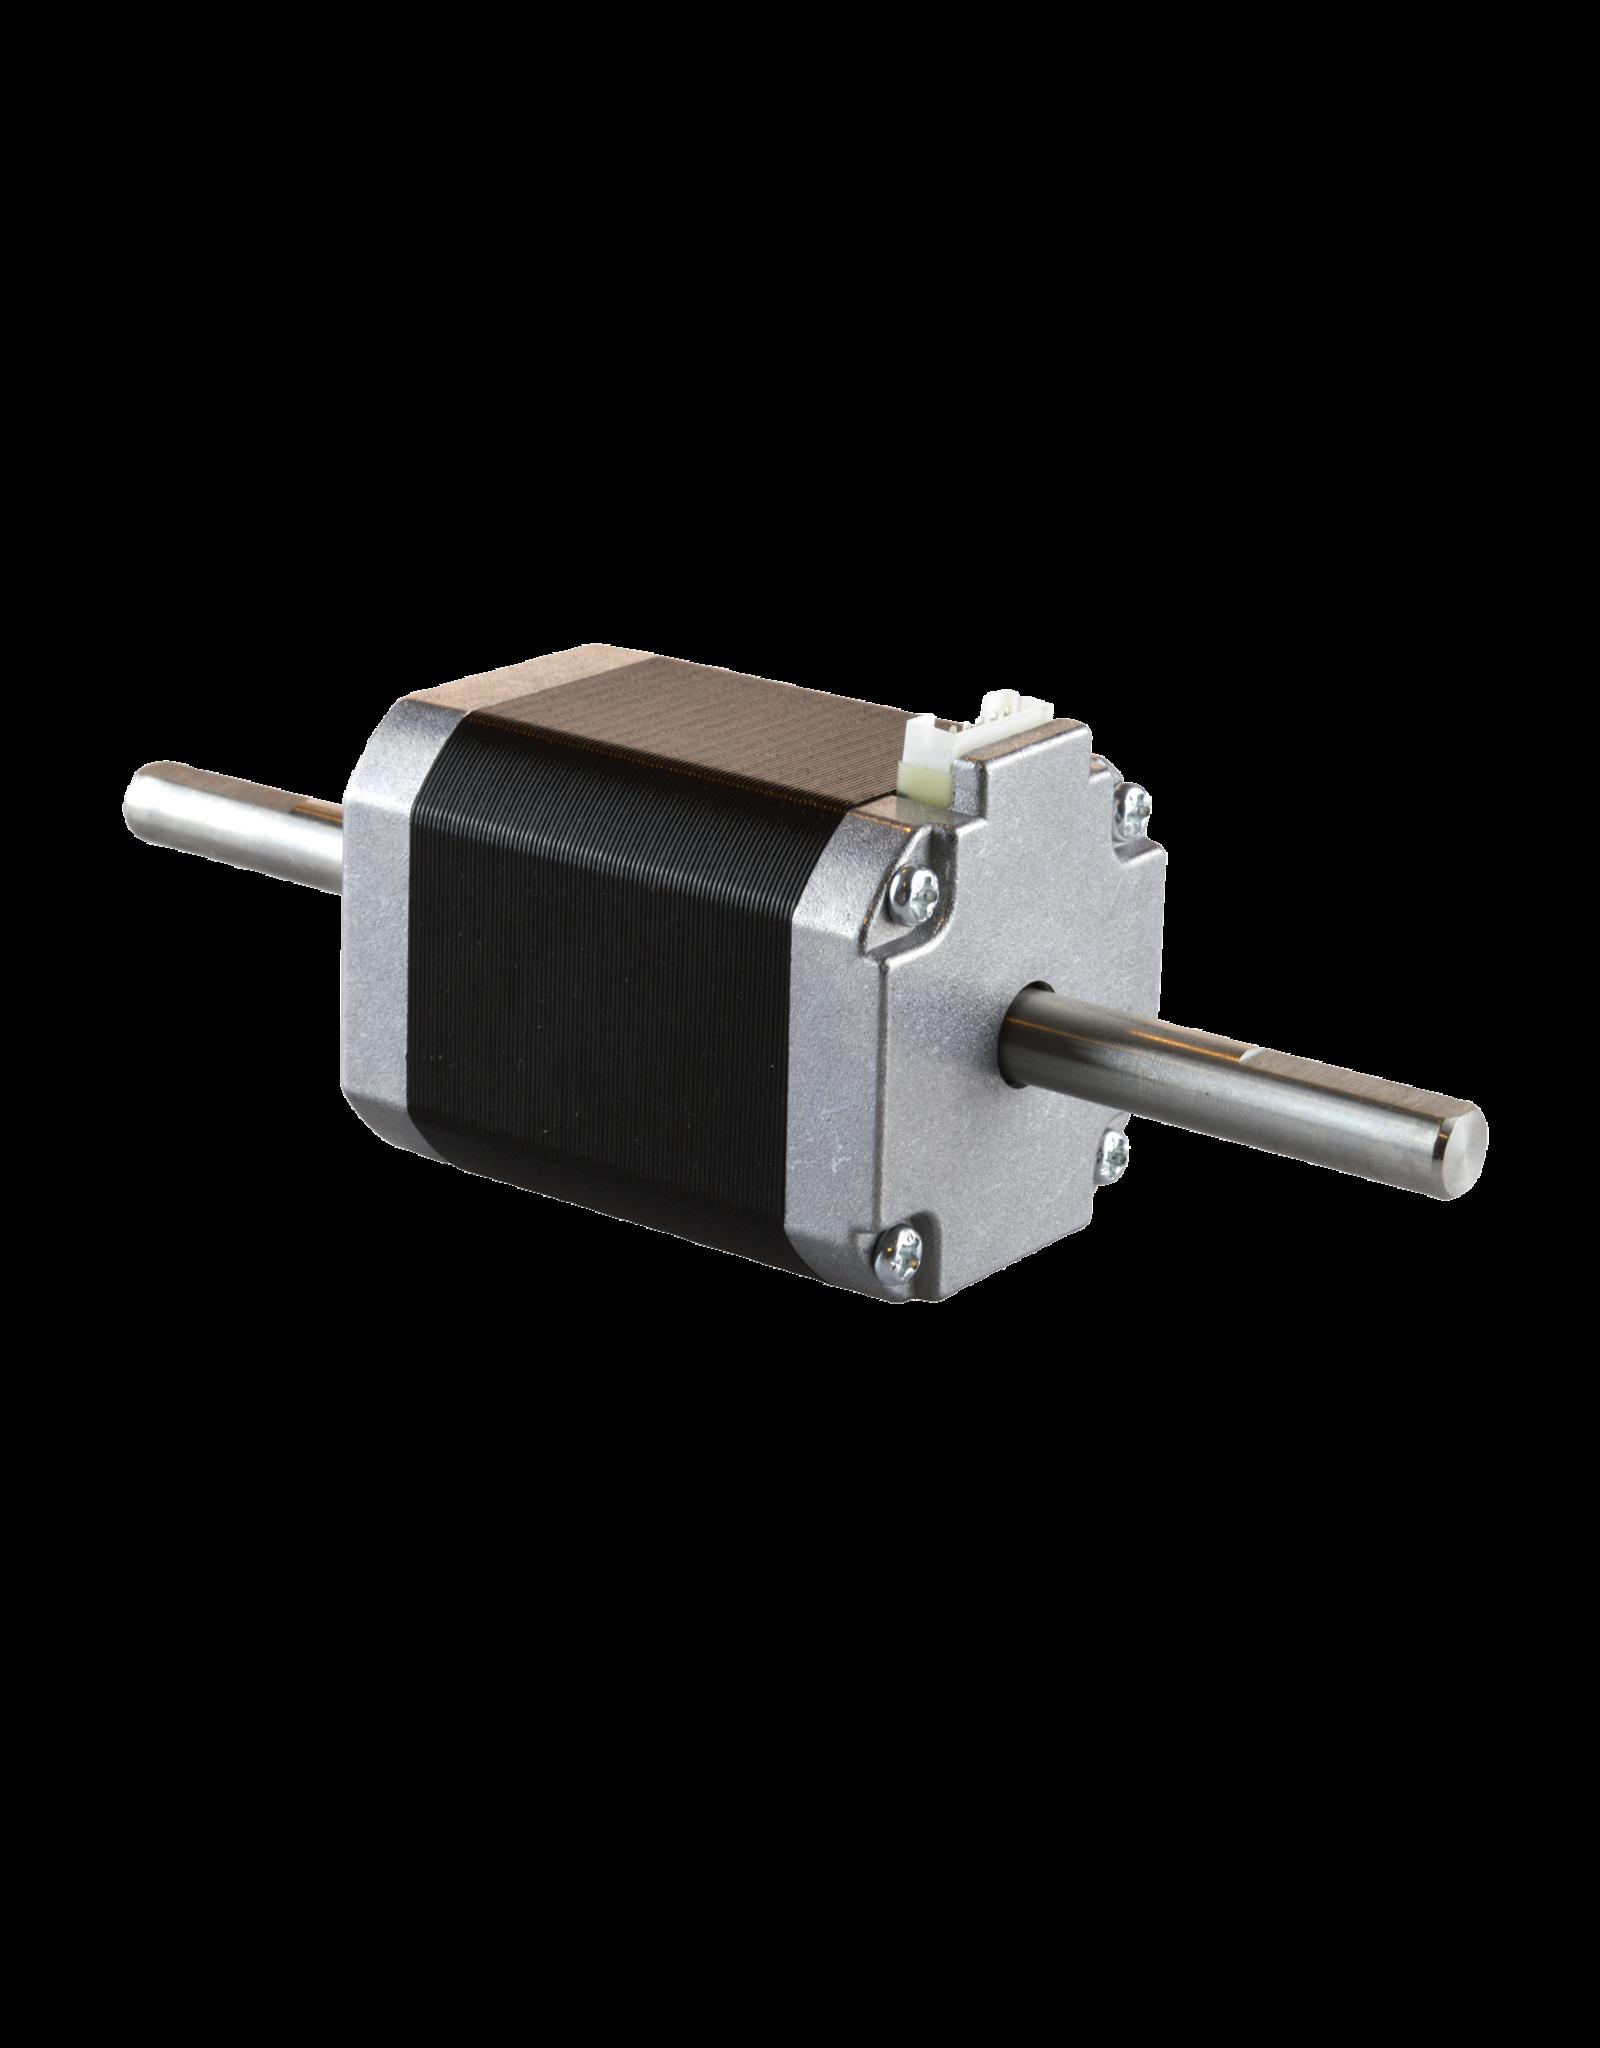 Creality/Ender  Creality 3D CR-10 Max Y-as-motor